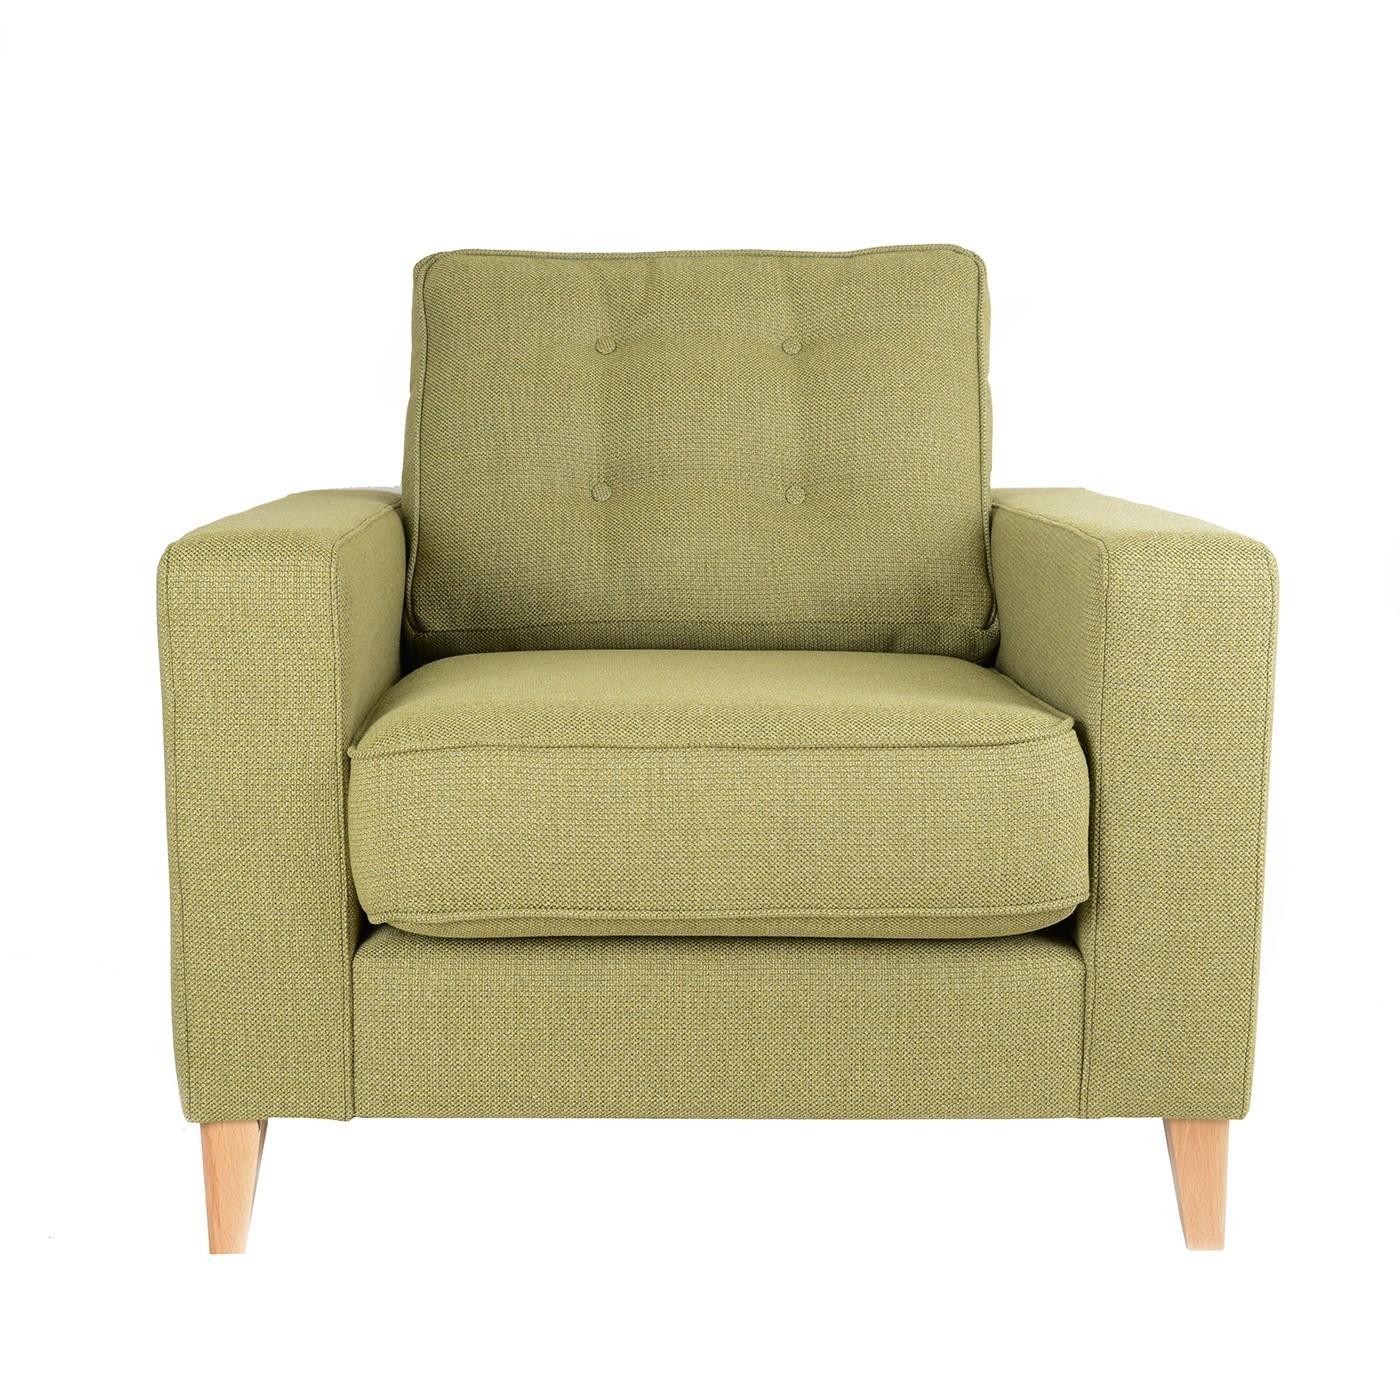 Modern Mid Century Furniture | The Mistral Sofa | Heal's Regarding Mid Range Sofas (Image 16 of 20)